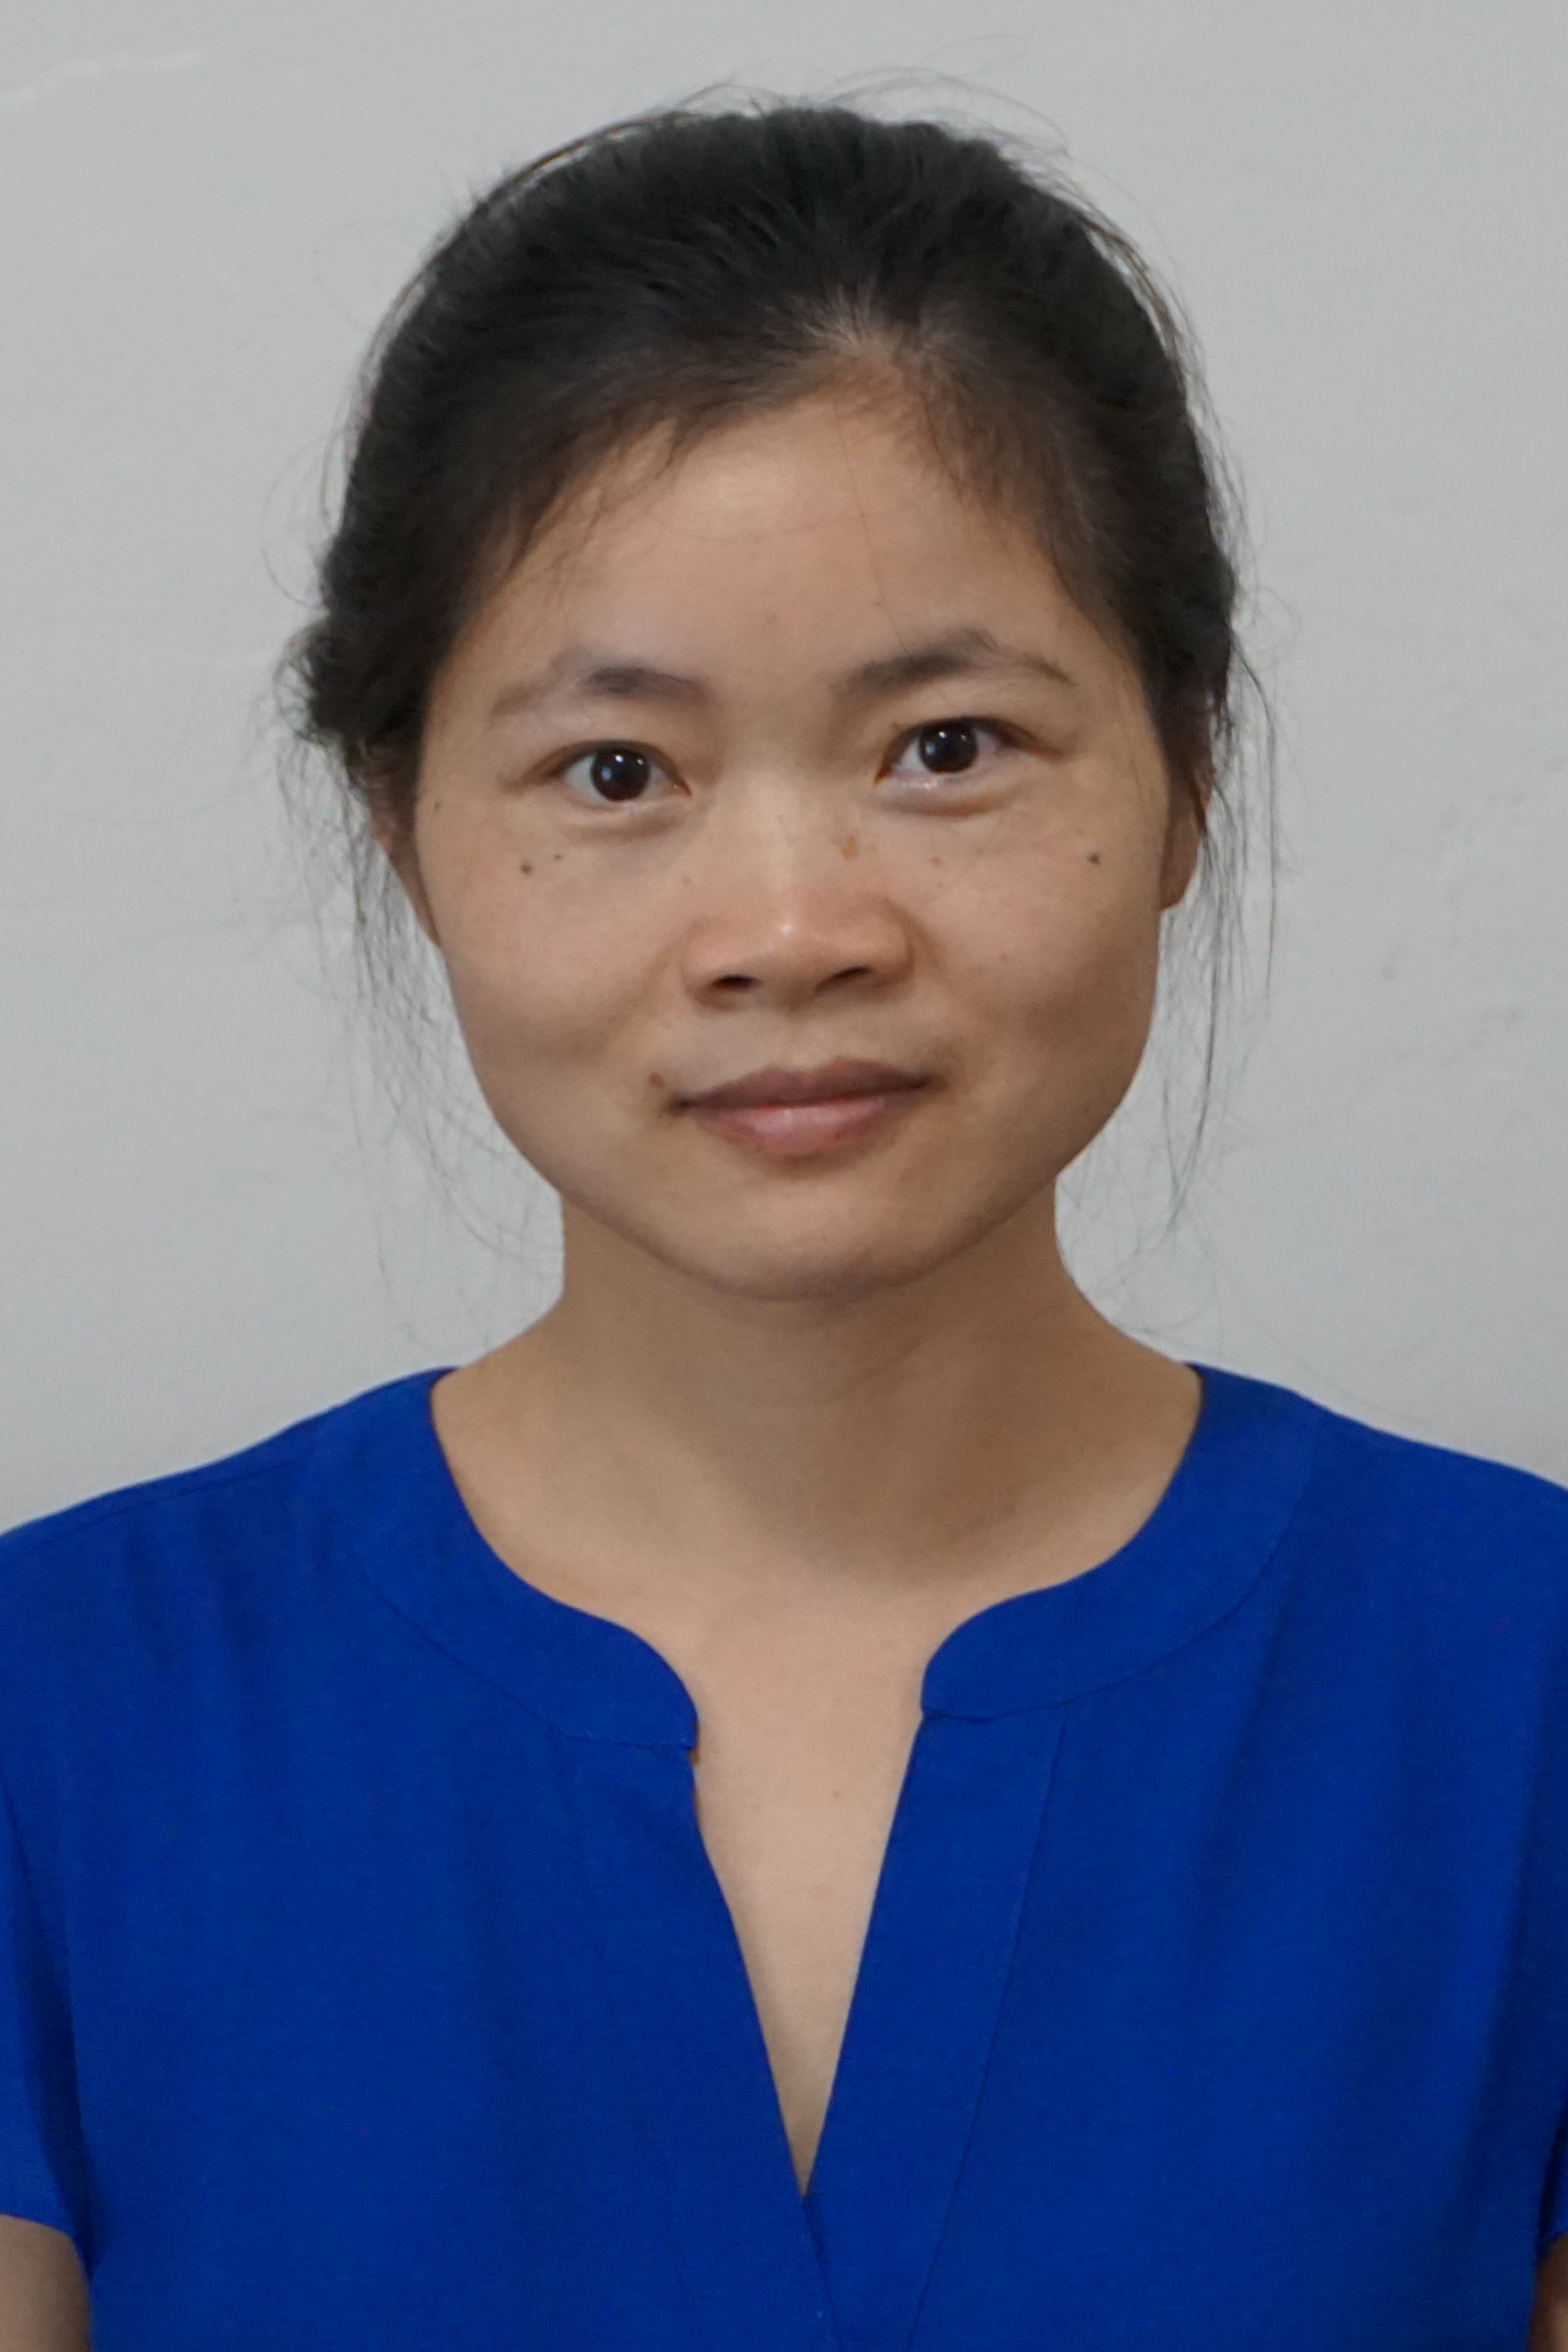 Ni Zhao